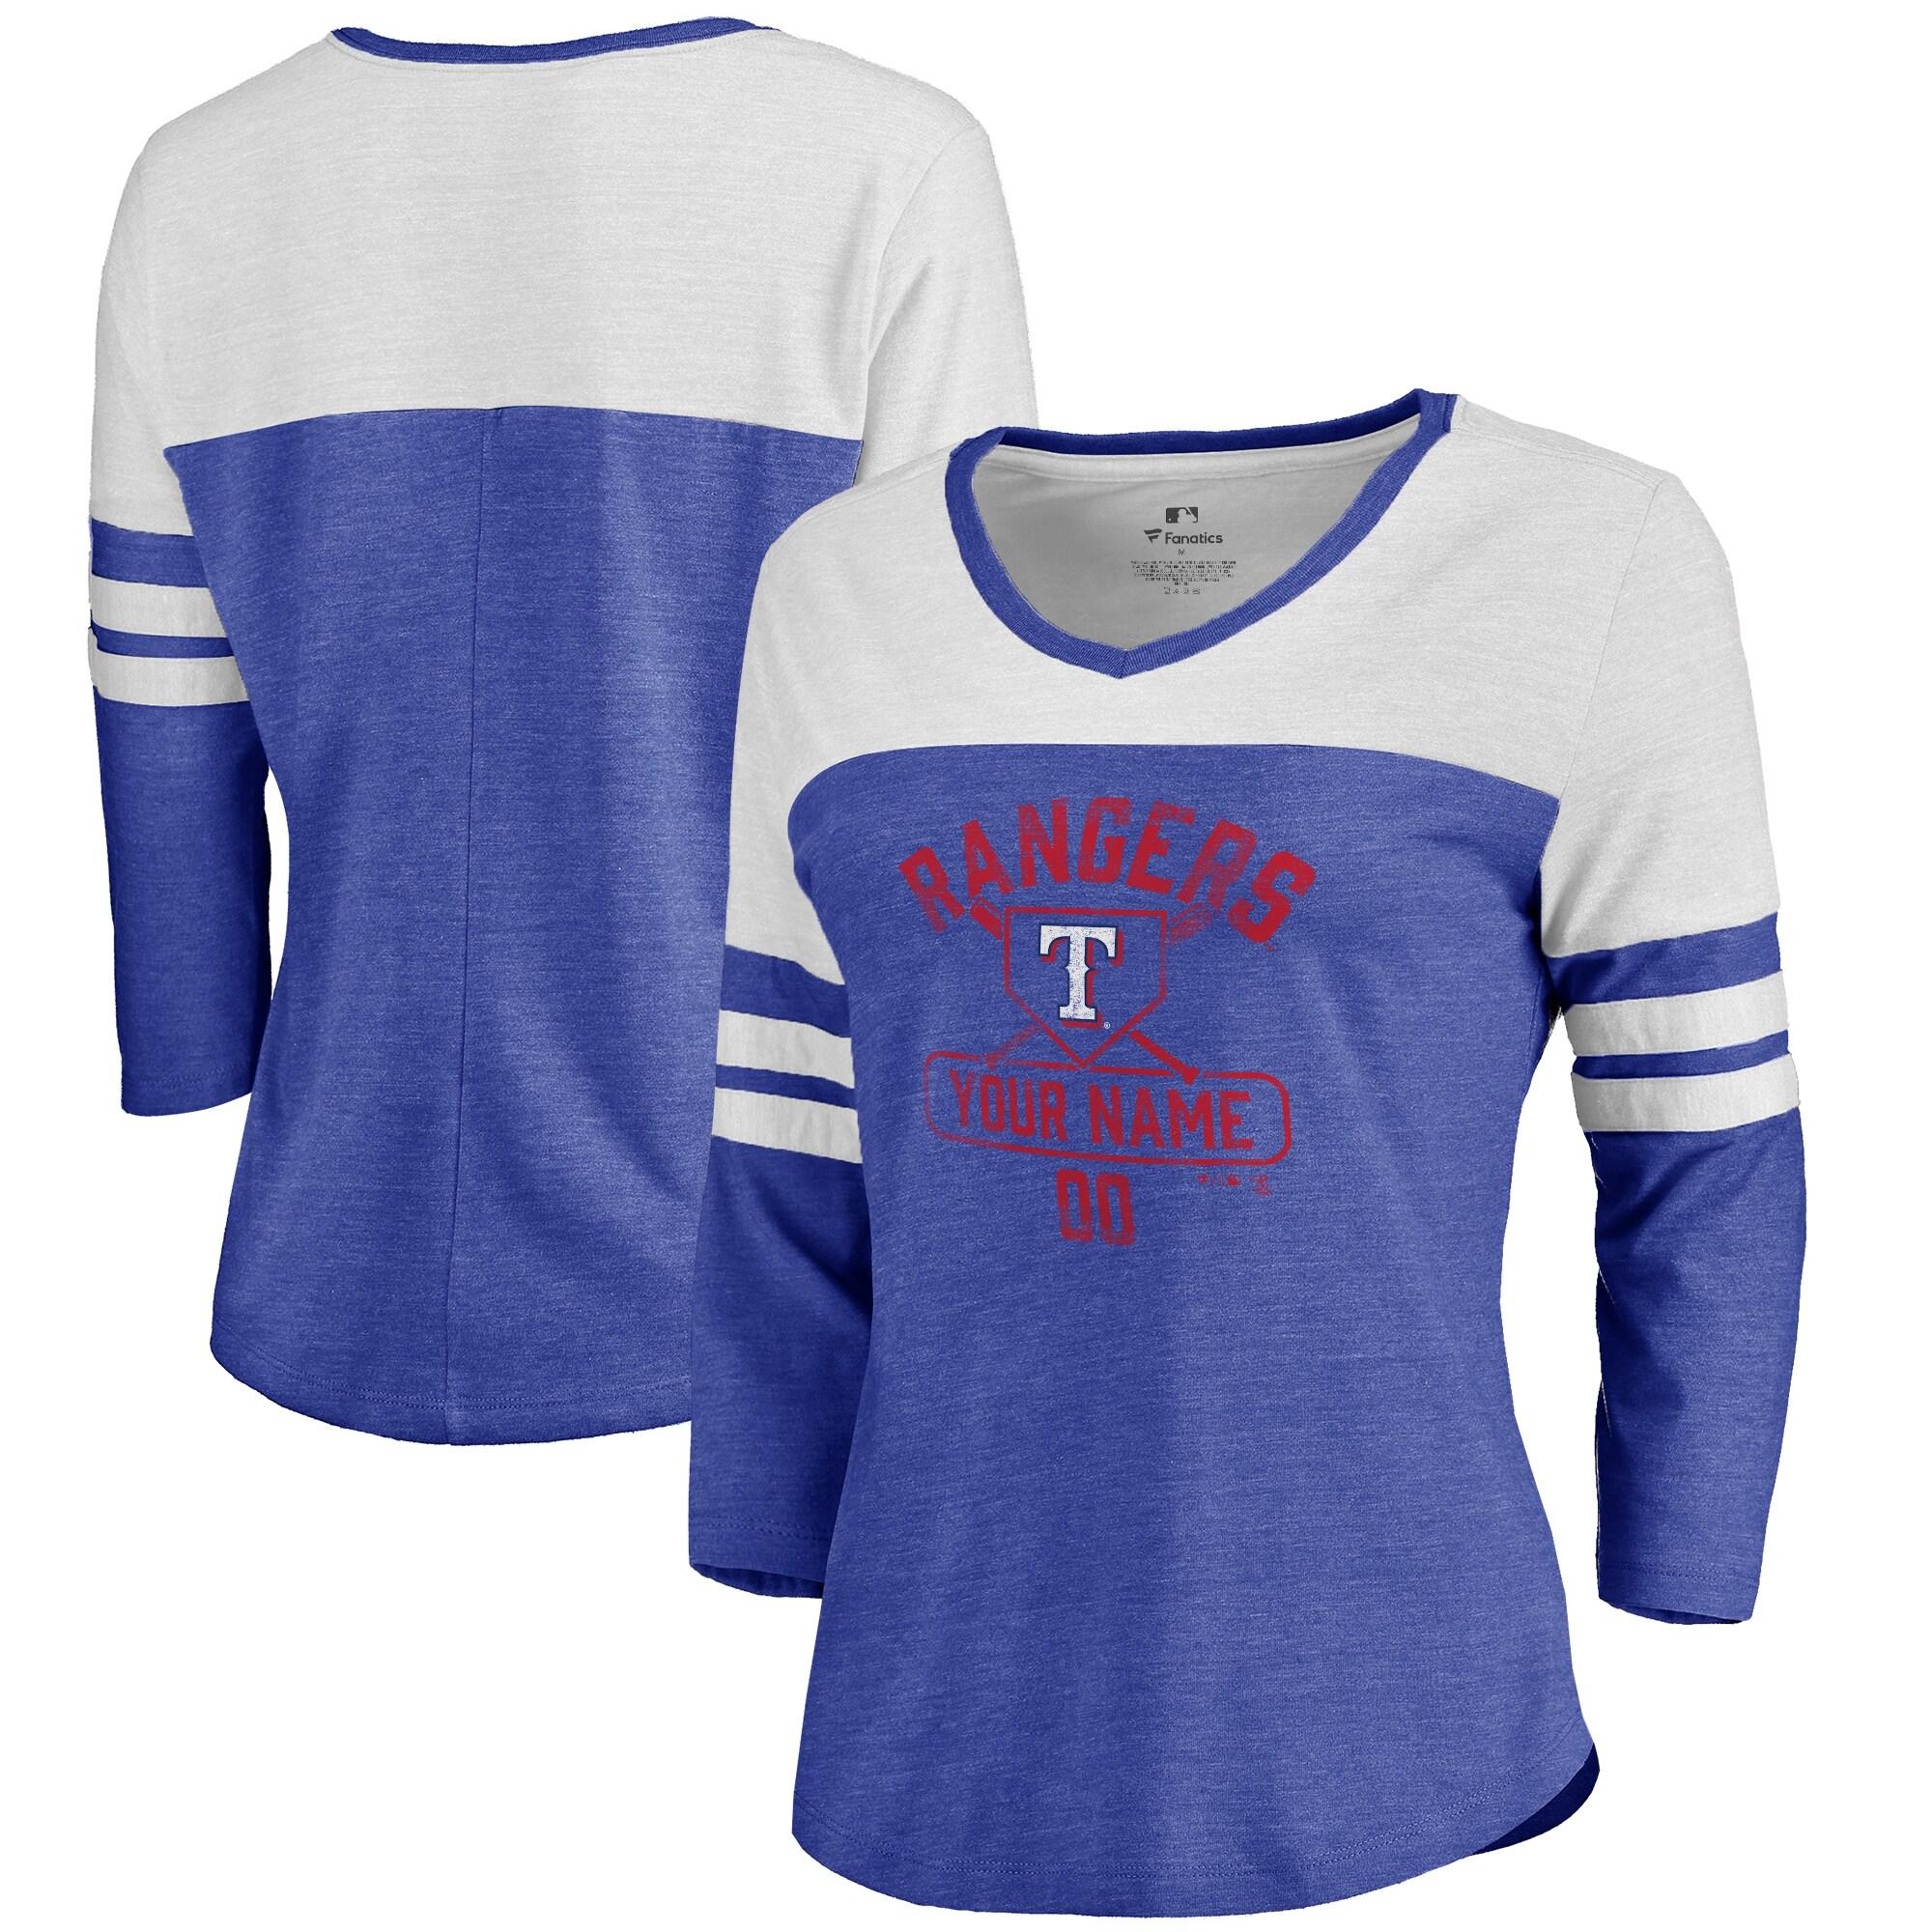 Texas Rangers Fanatics Branded Women's Personalized Base Runner Tri-Blend Three-Quarter Sleeve T-Shirt - Royal